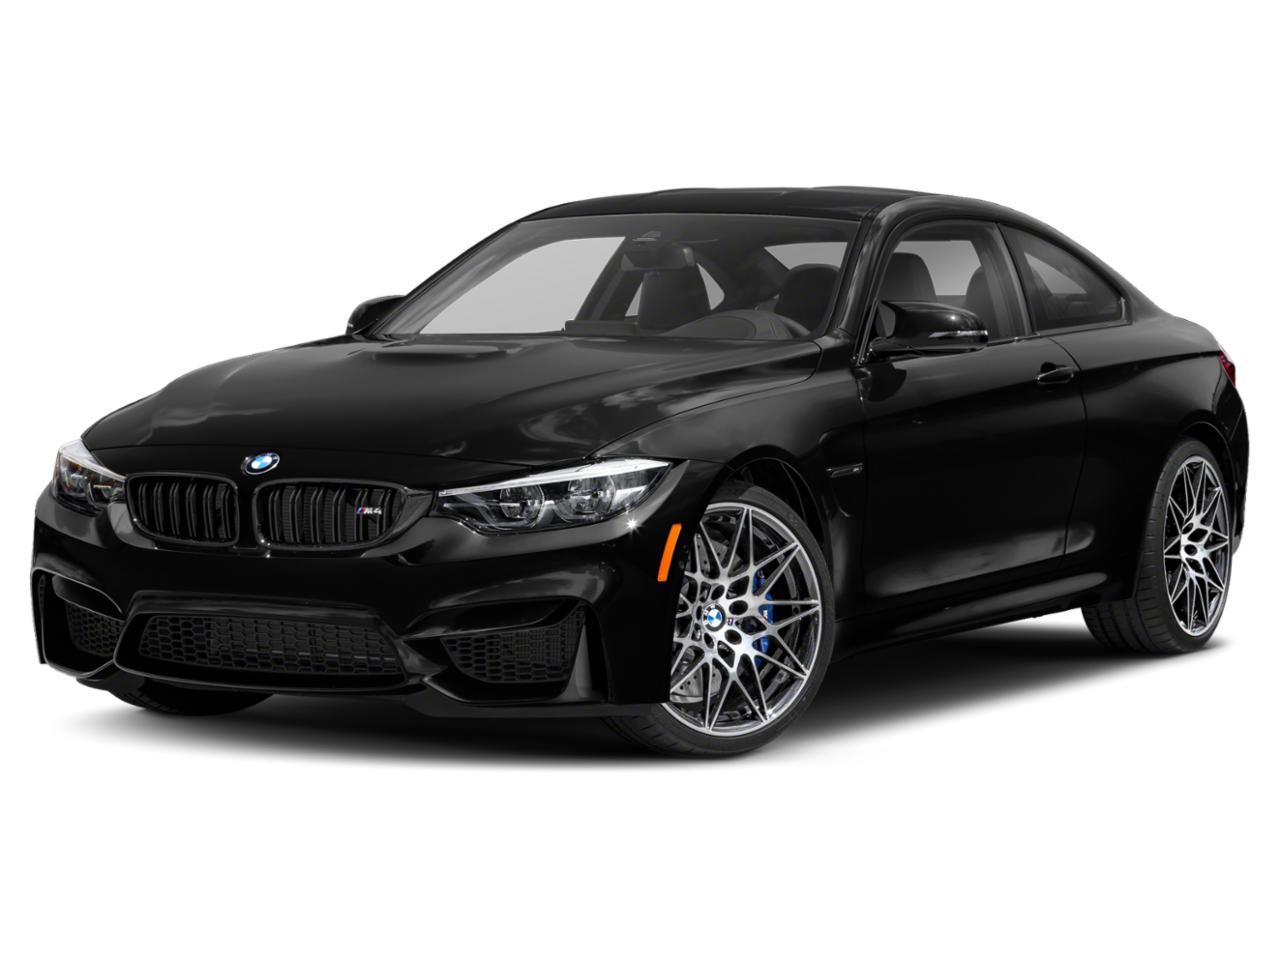 2019 BMW M4 Vehicle Photo in Denver, CO 80123